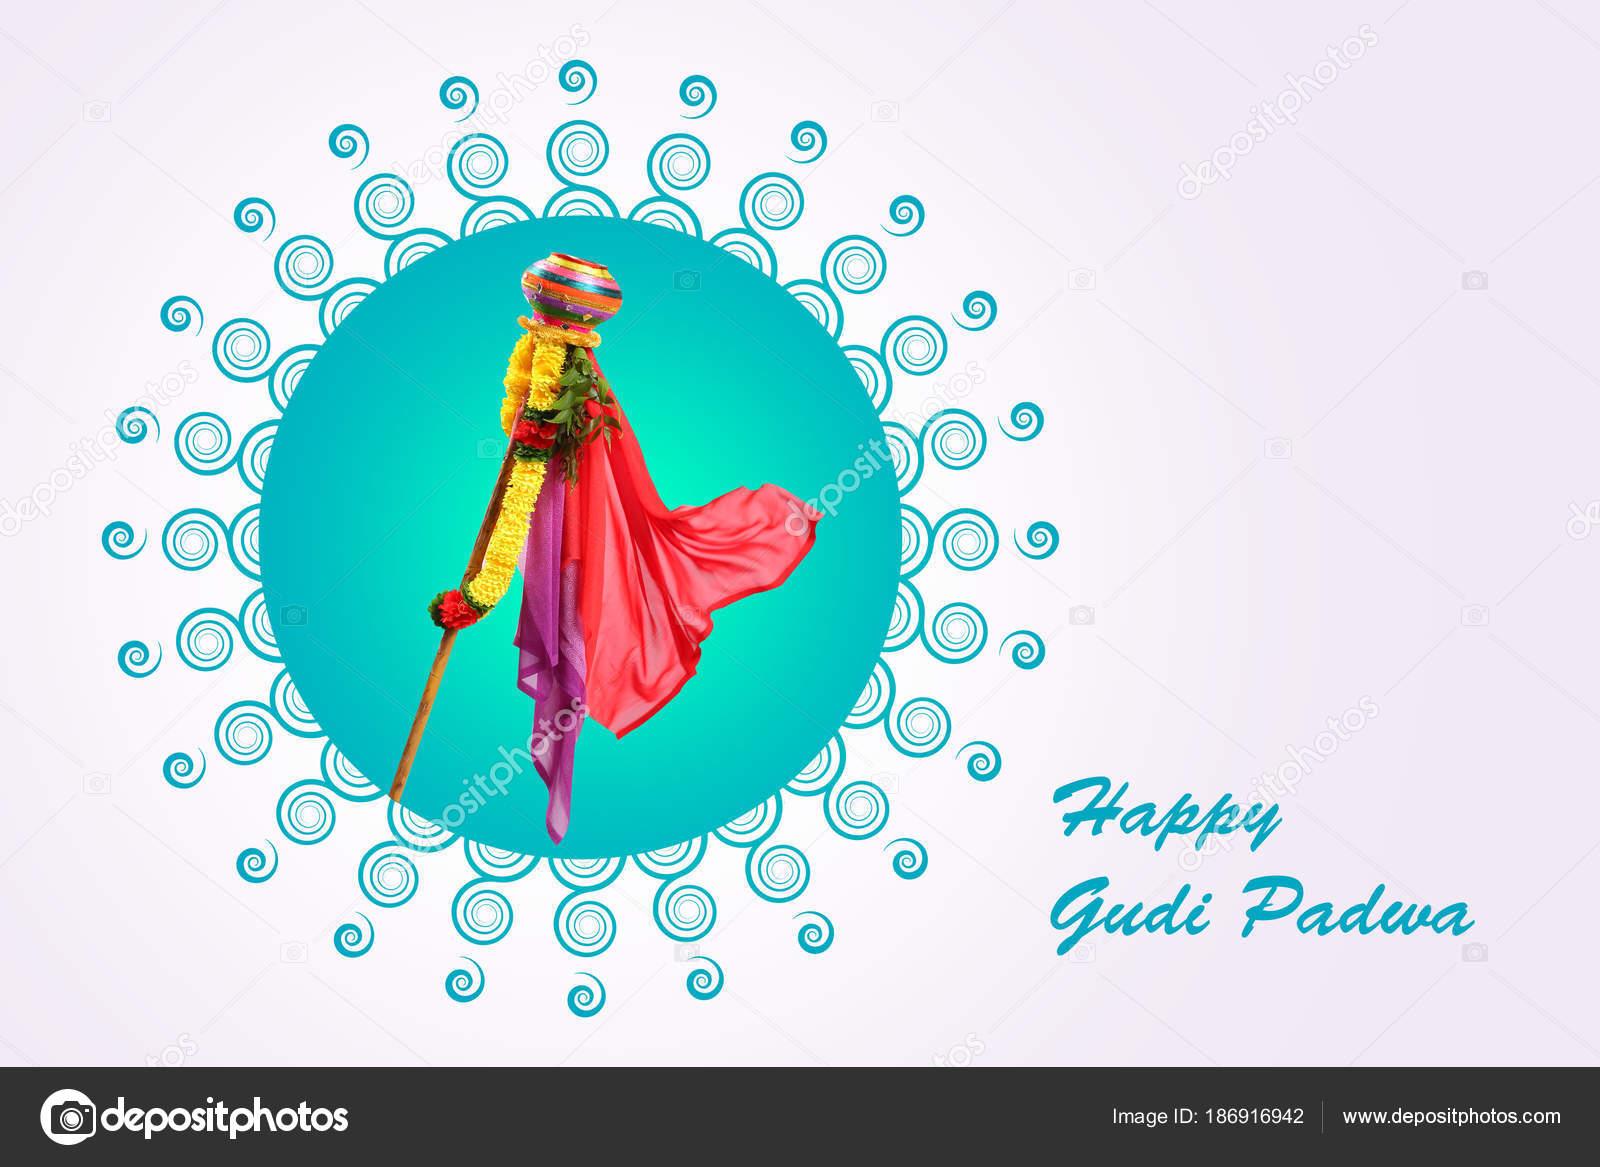 Gudi padwa marathi new year stock photo adsniksgmail 186916942 gudi padwa marathi new year stock photo m4hsunfo